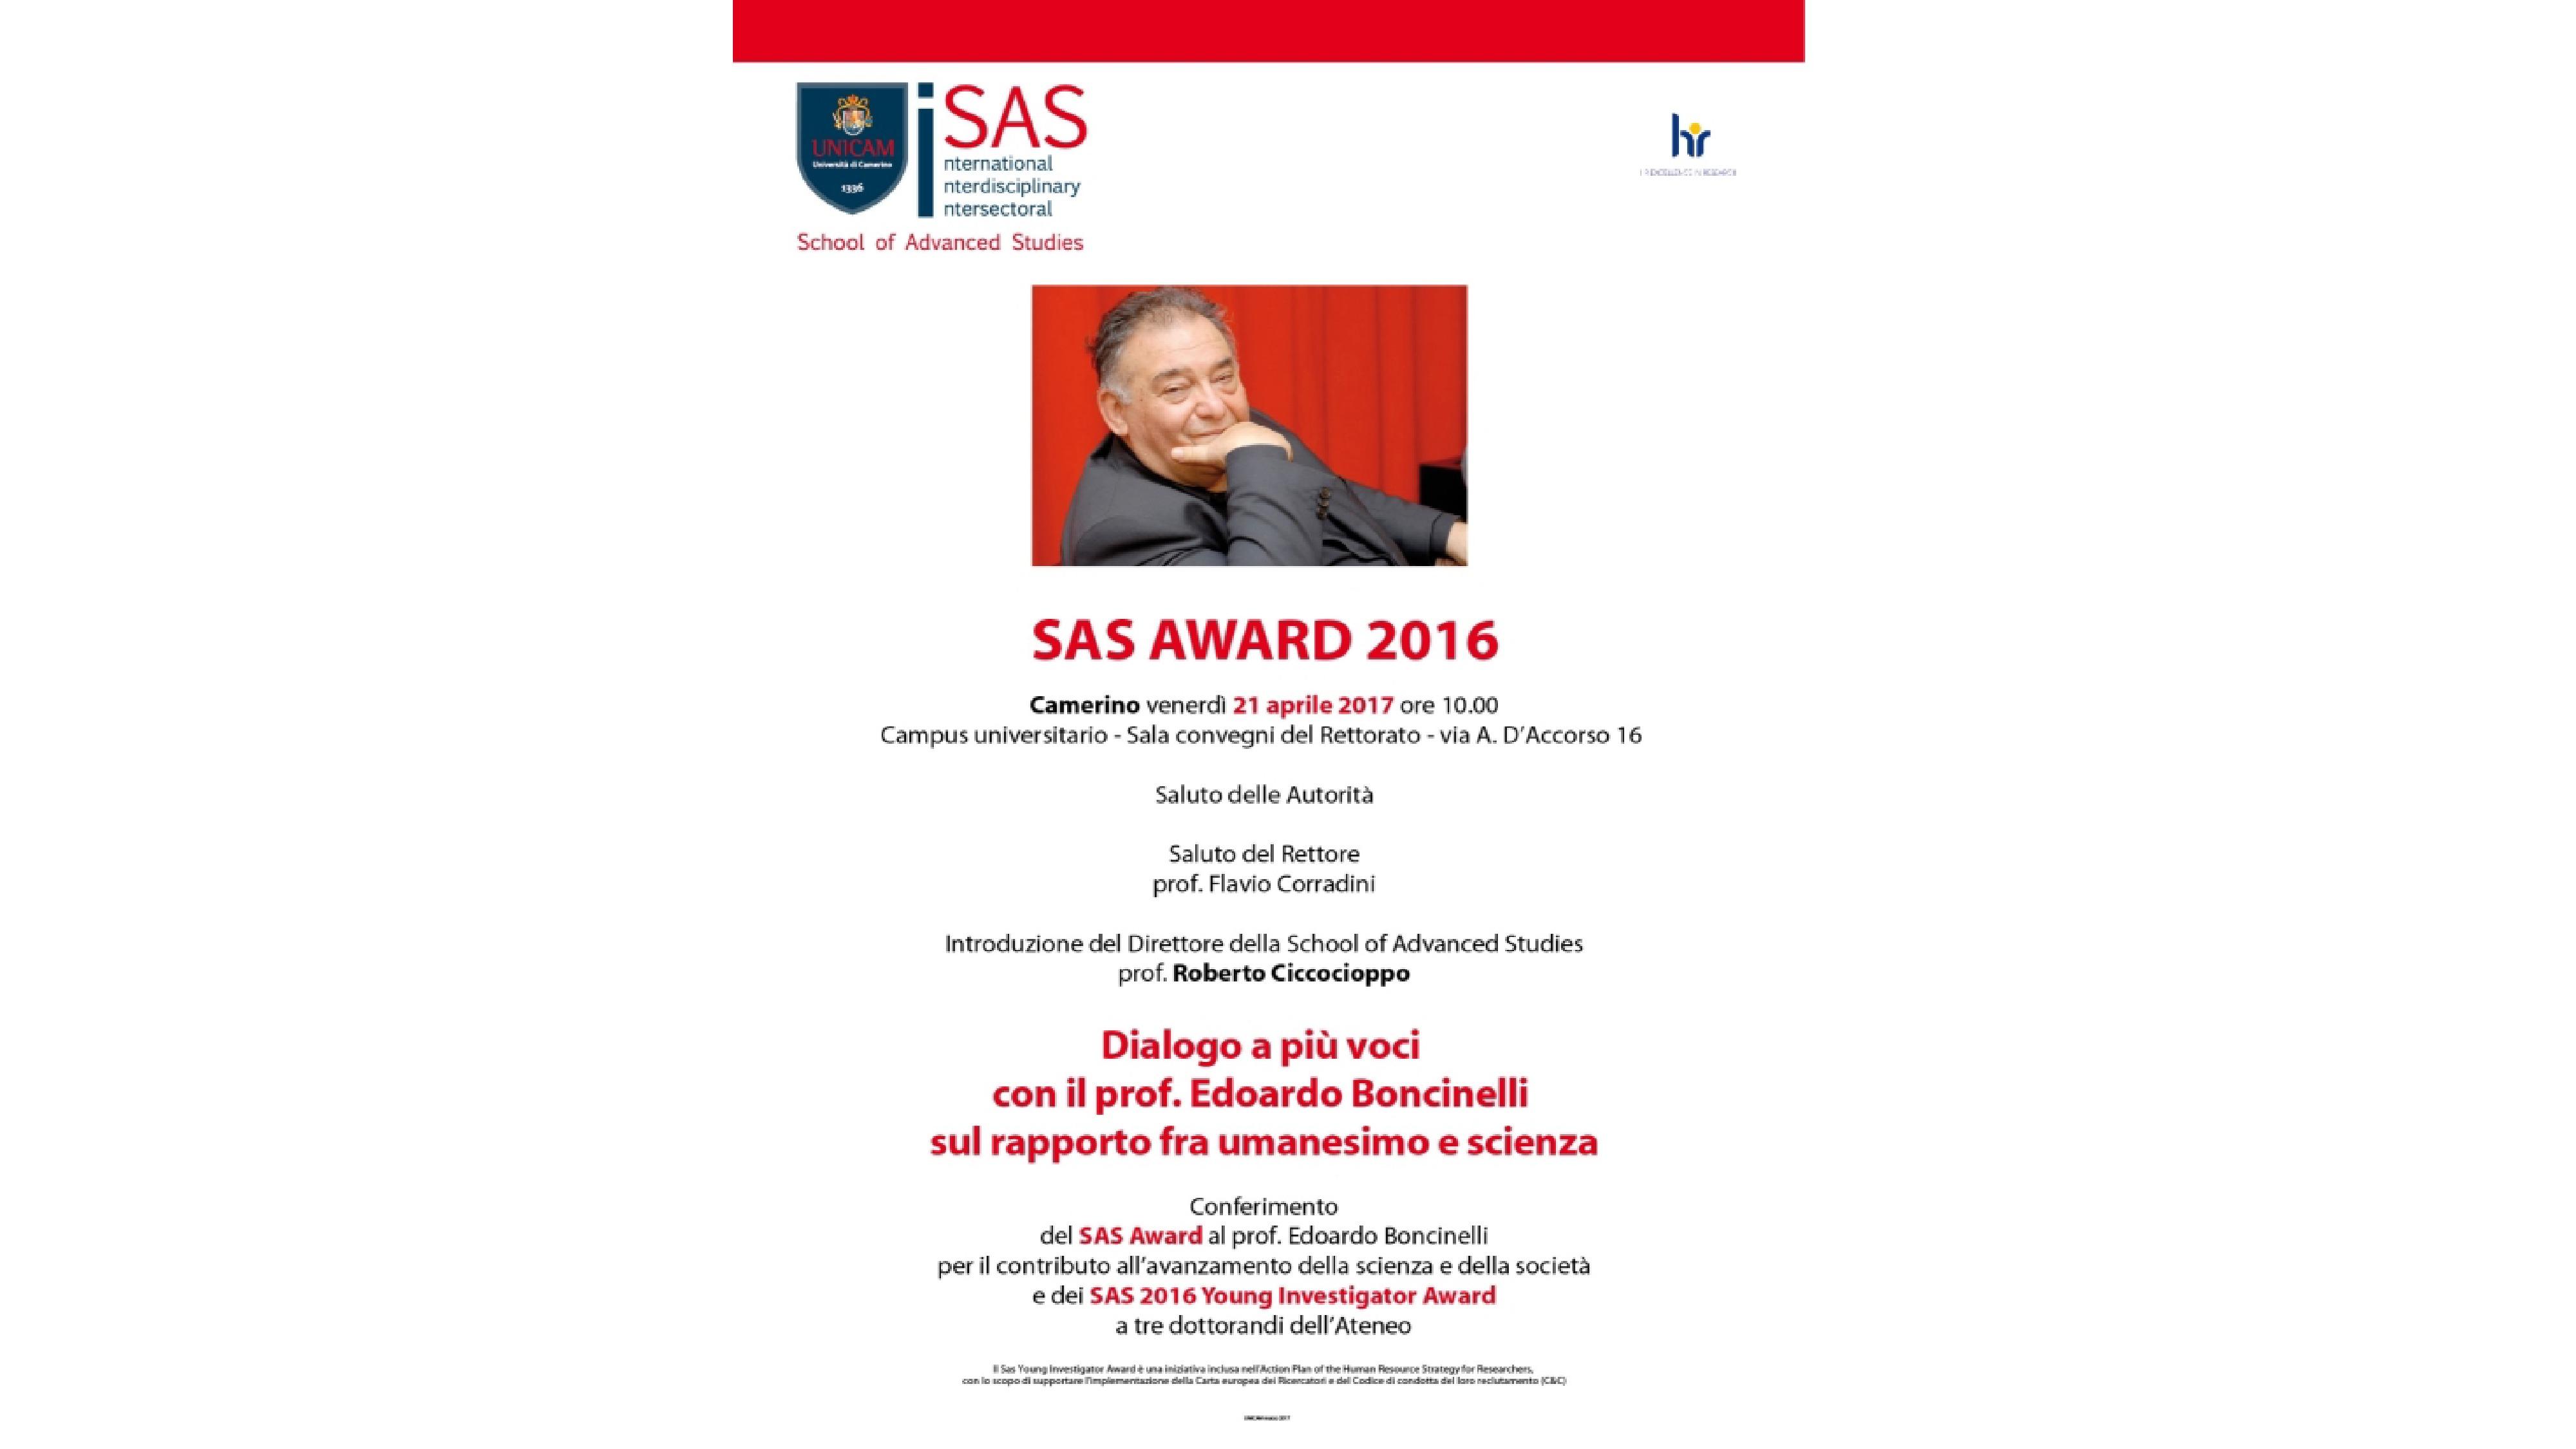 SAS AWARD 2016 - prize-giving ceremony